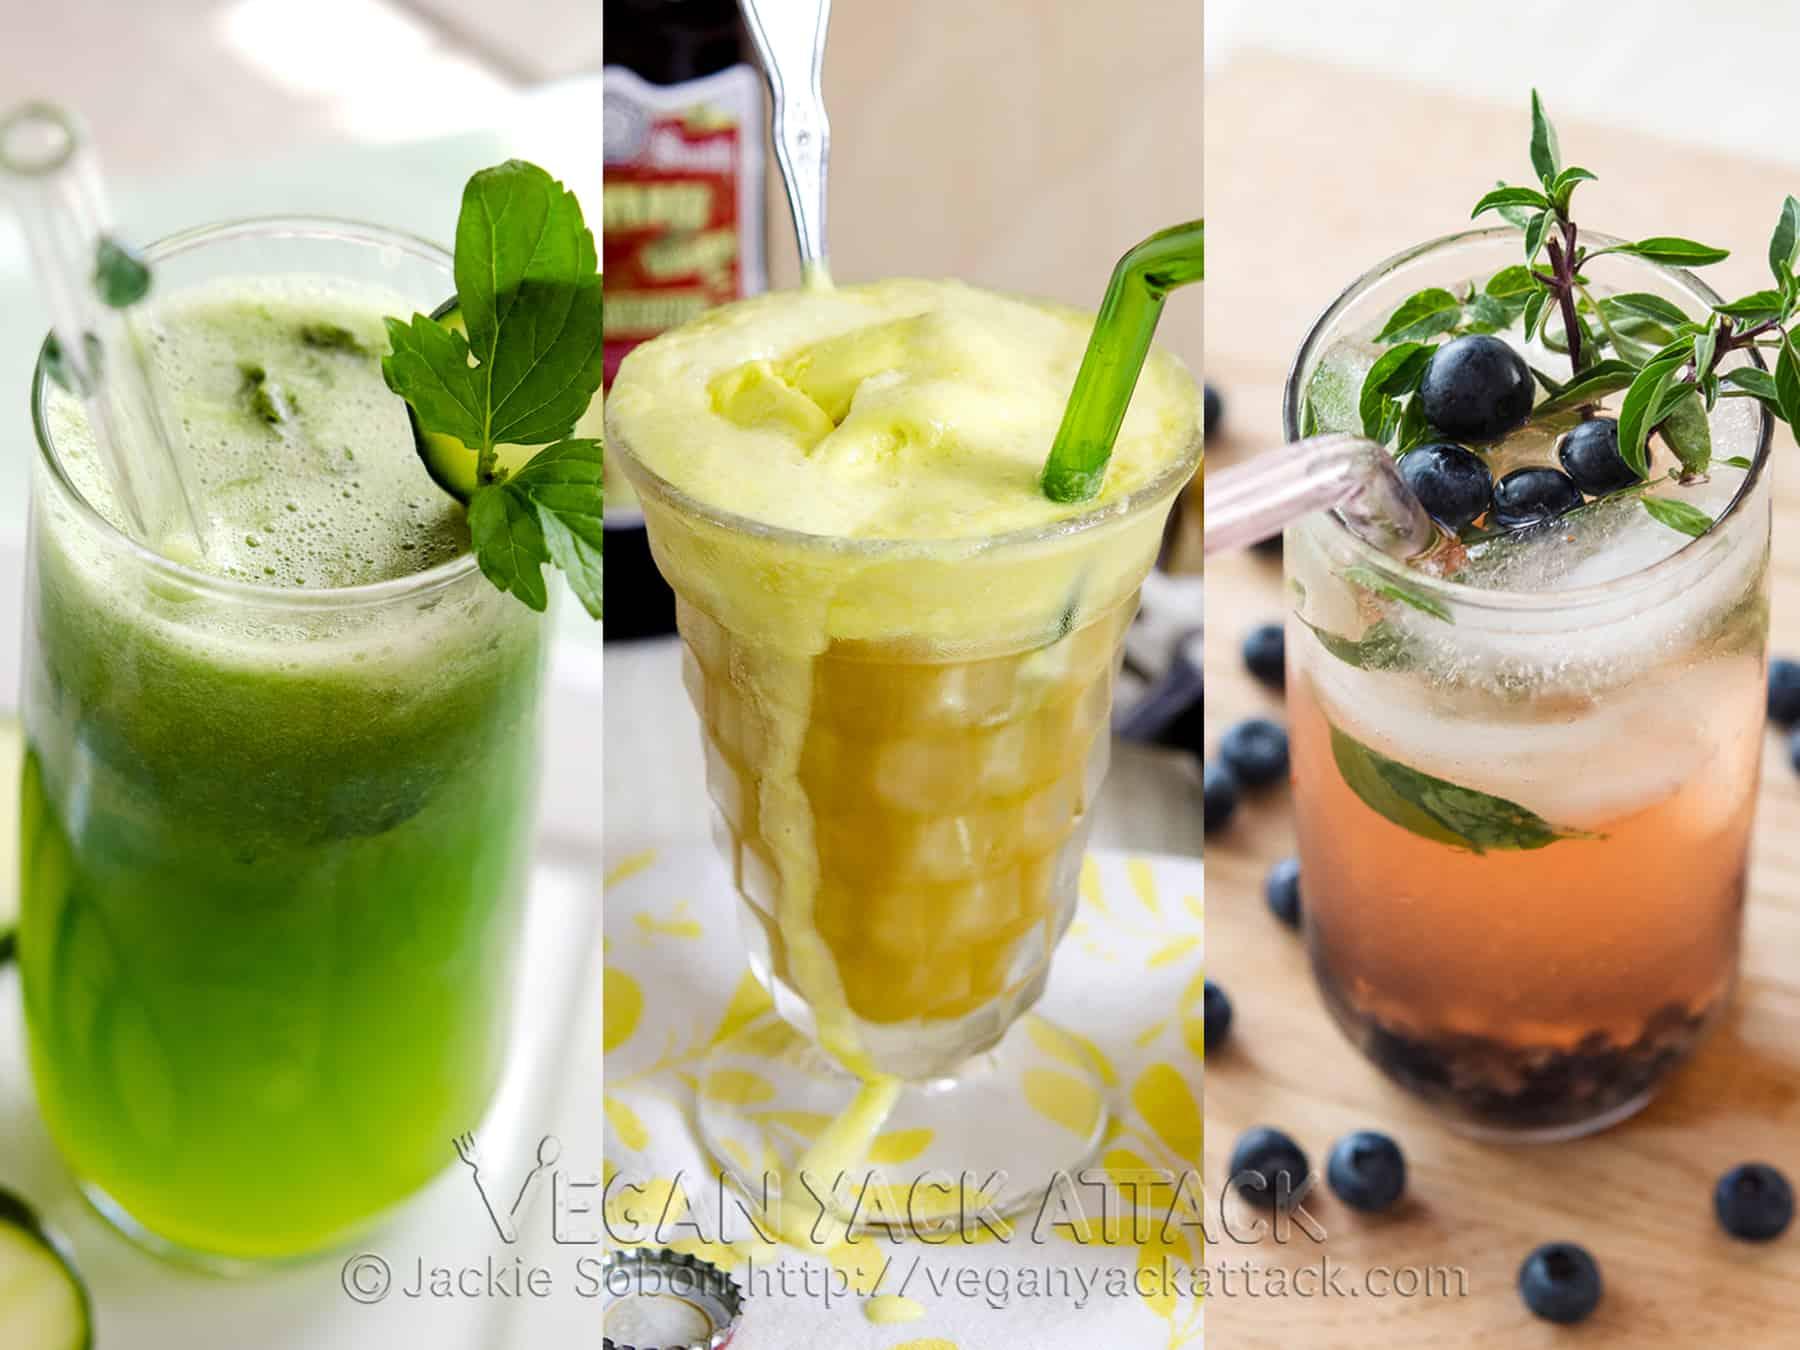 A trio of brunch beverages